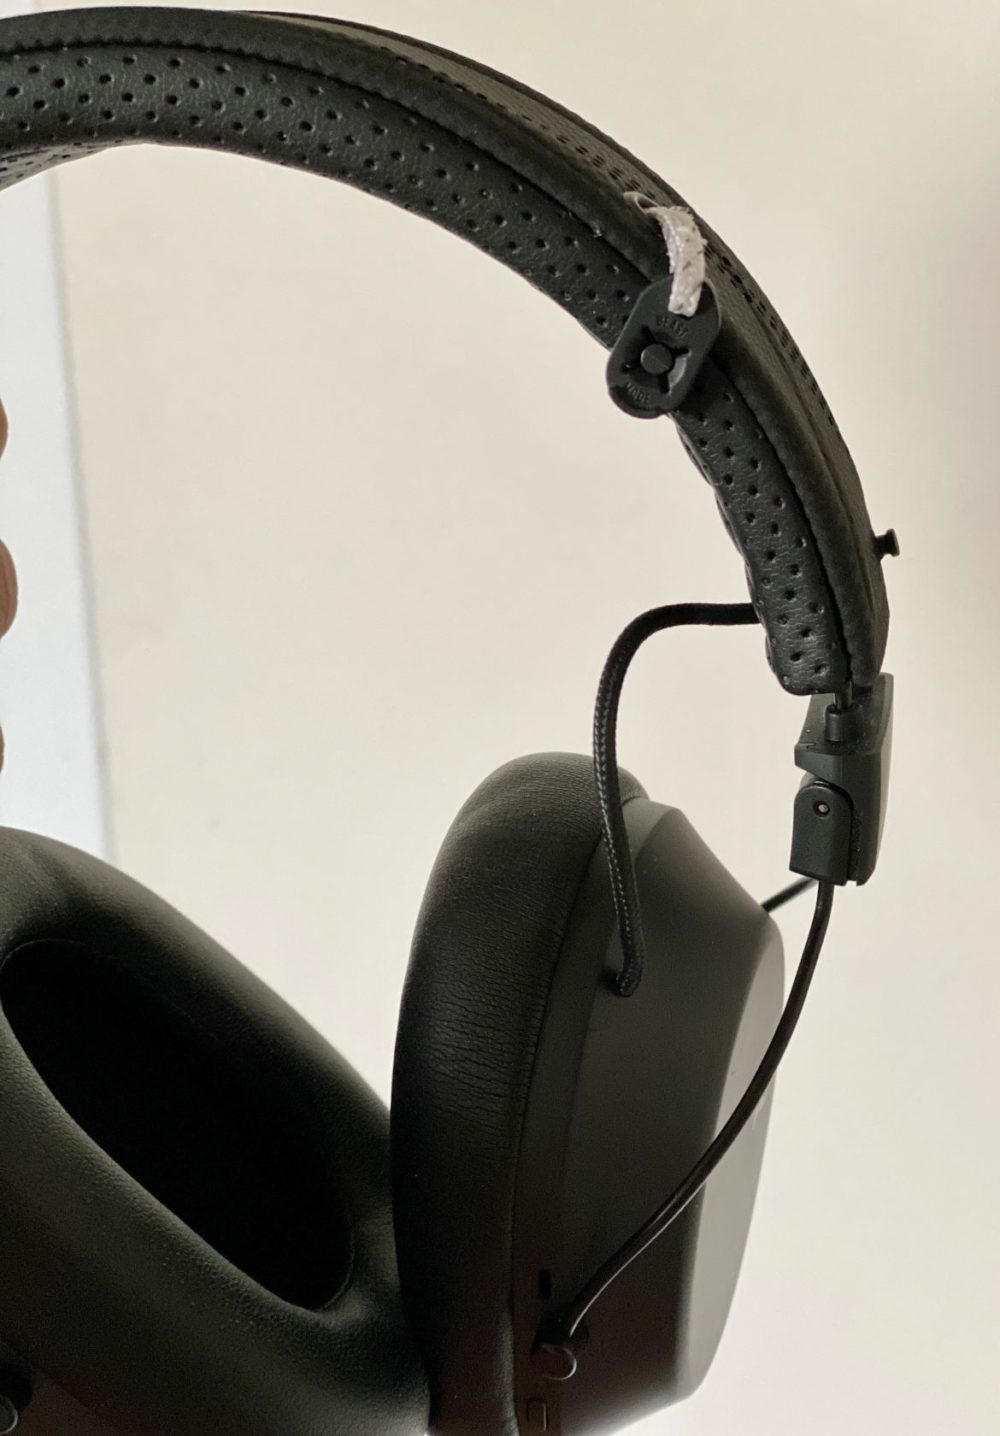 BackBeat Fit 6100 senses.se